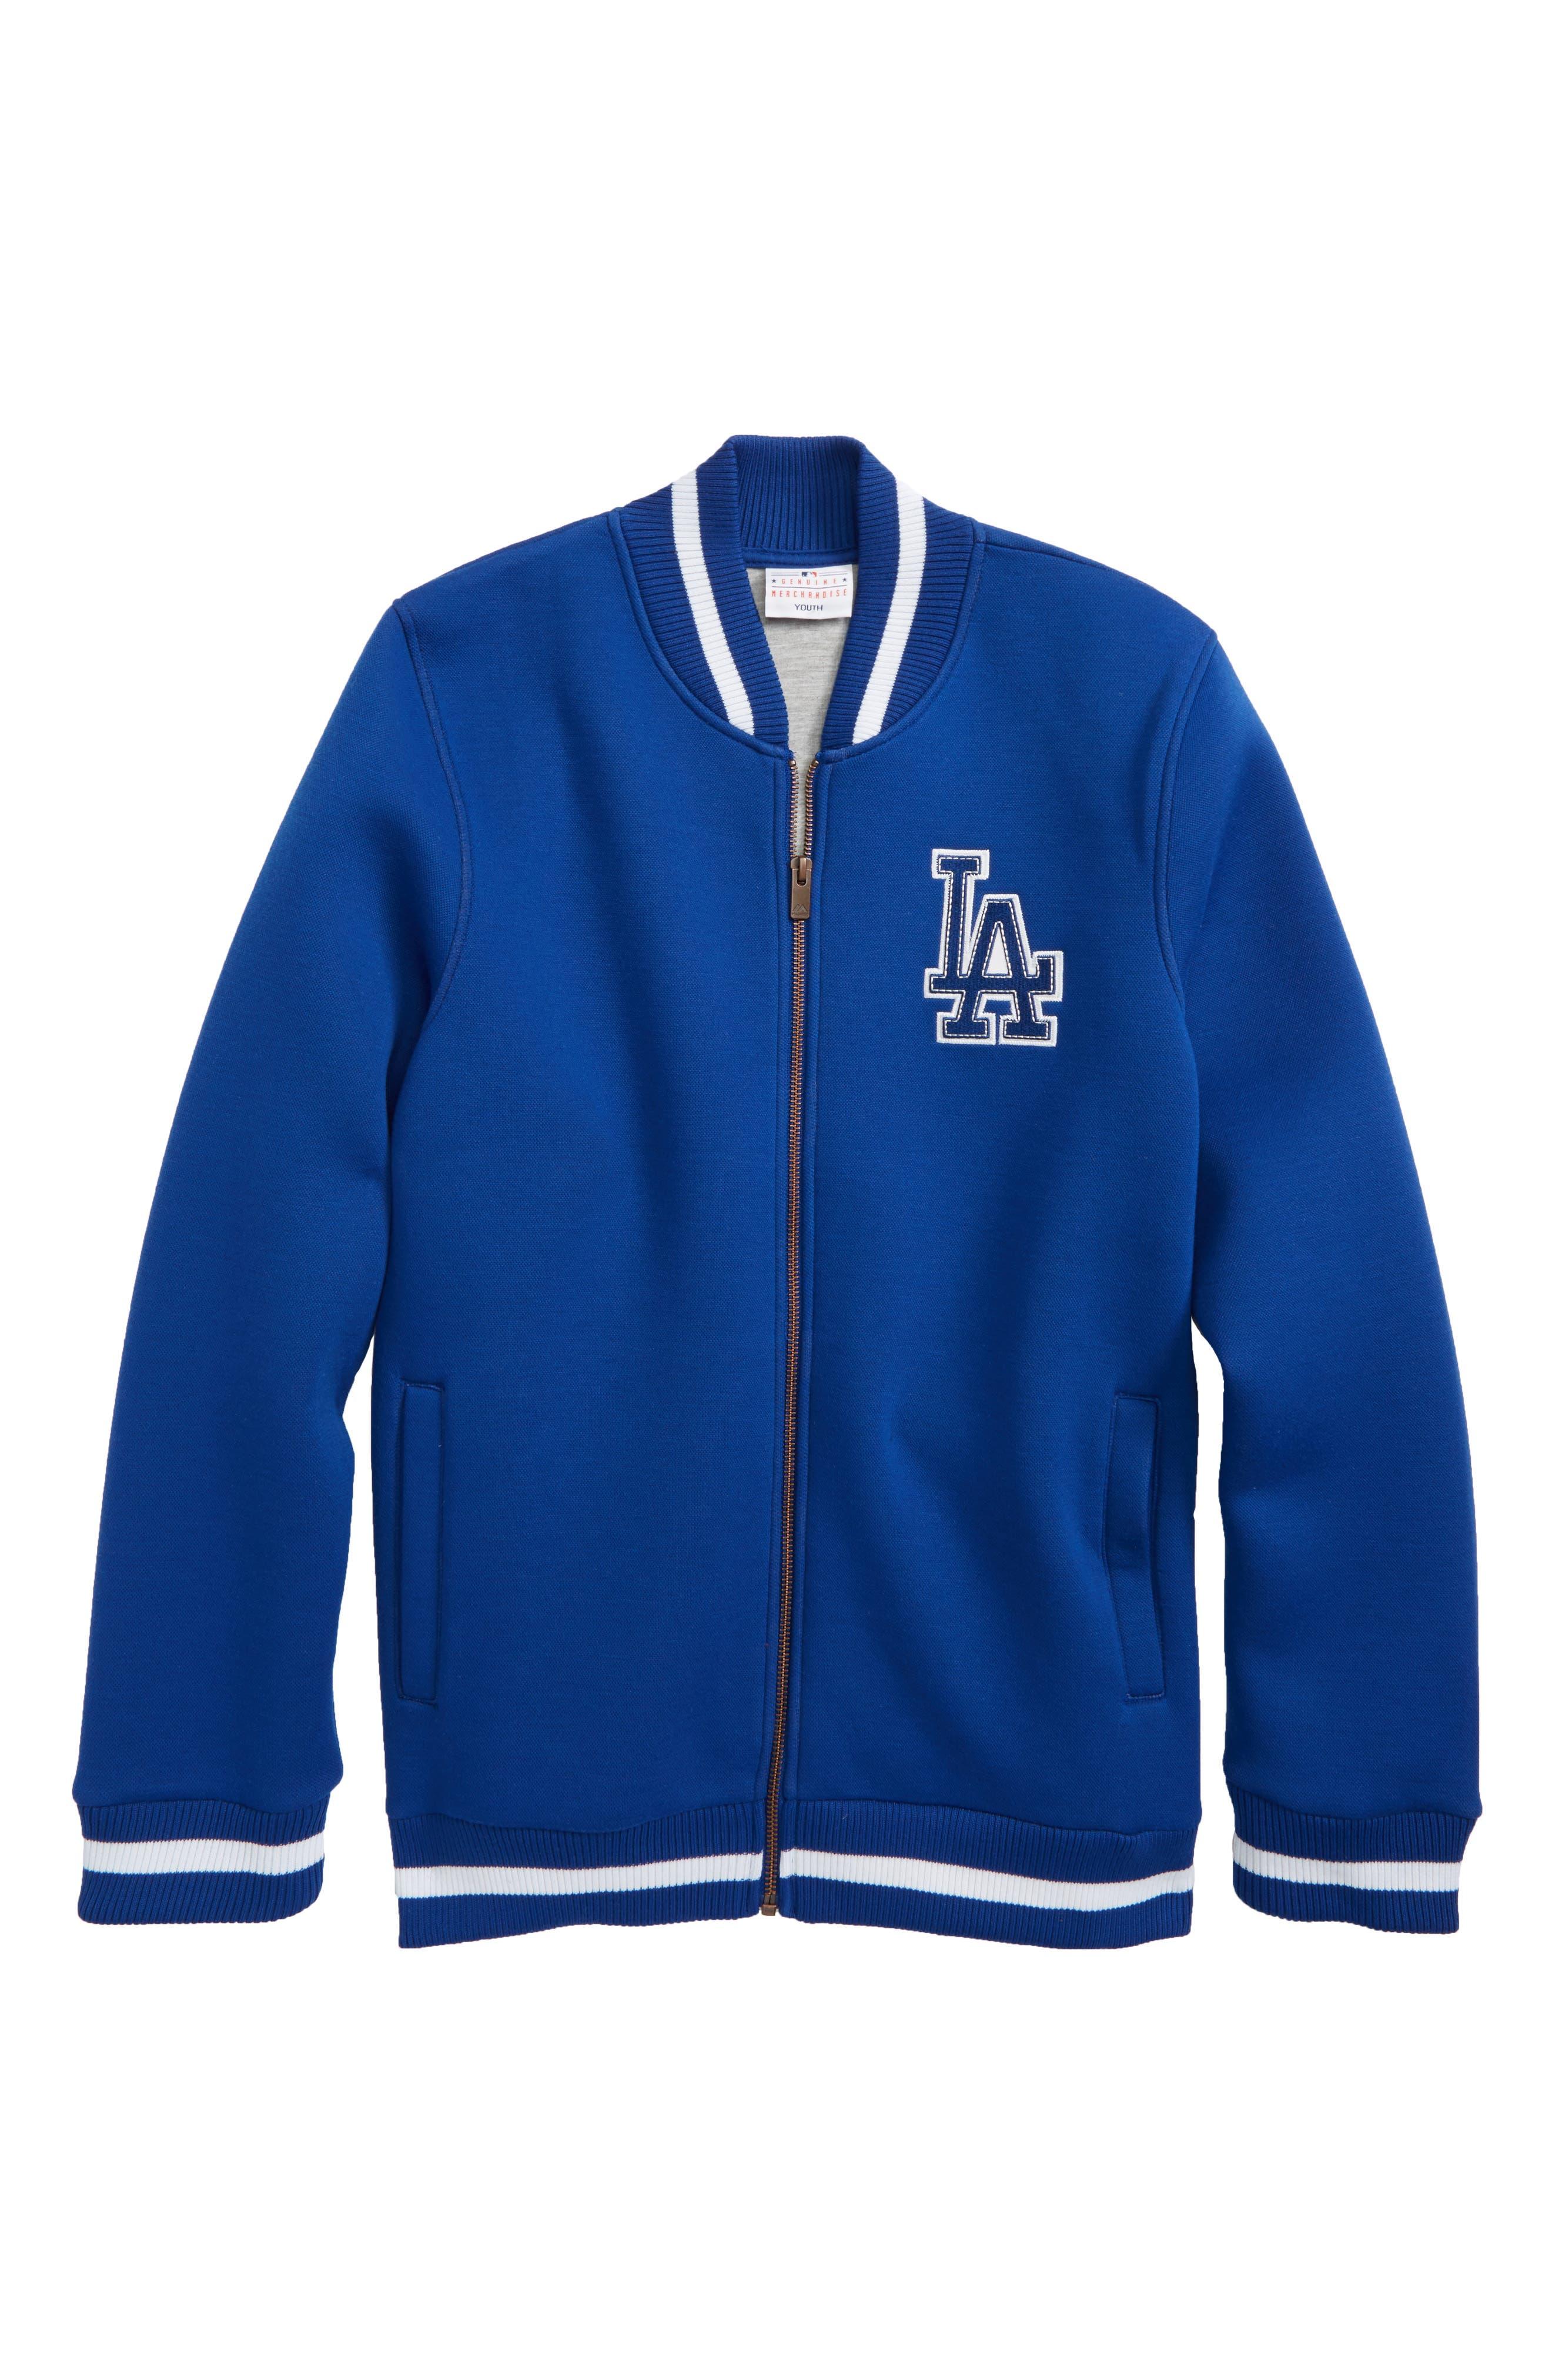 Classical Los Angeles Dodgers Knit Varsity Jacket,                             Main thumbnail 1, color,                             400